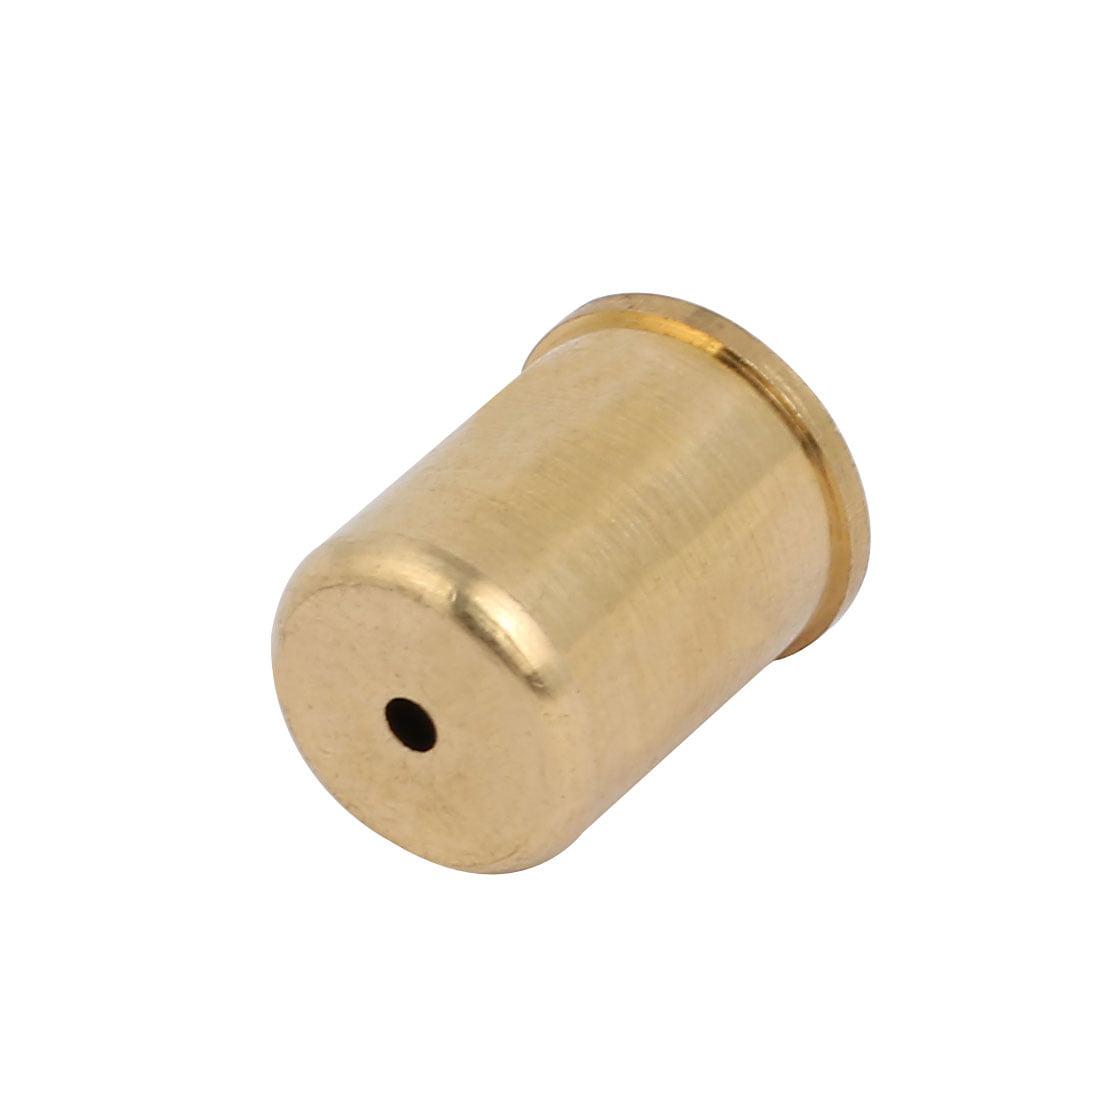 Unique Bargains 3pcs 12mm Dia Brass Body Press In Type Ball Nose Spring Plunger - image 3 de 4